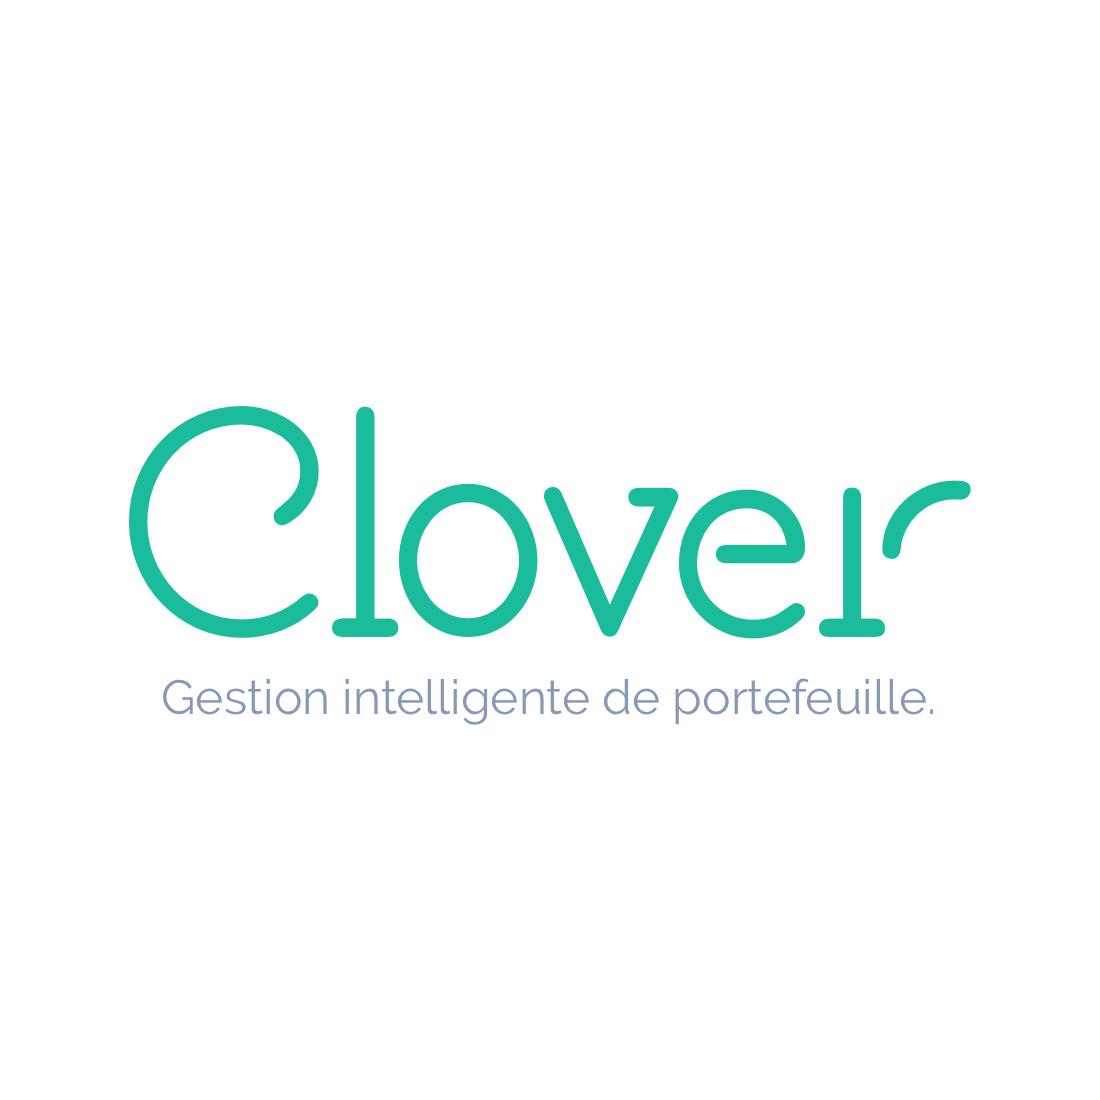 Logo SOCIÉTÉ CLOVER INTELLIGENCE ARTIFICIELLE